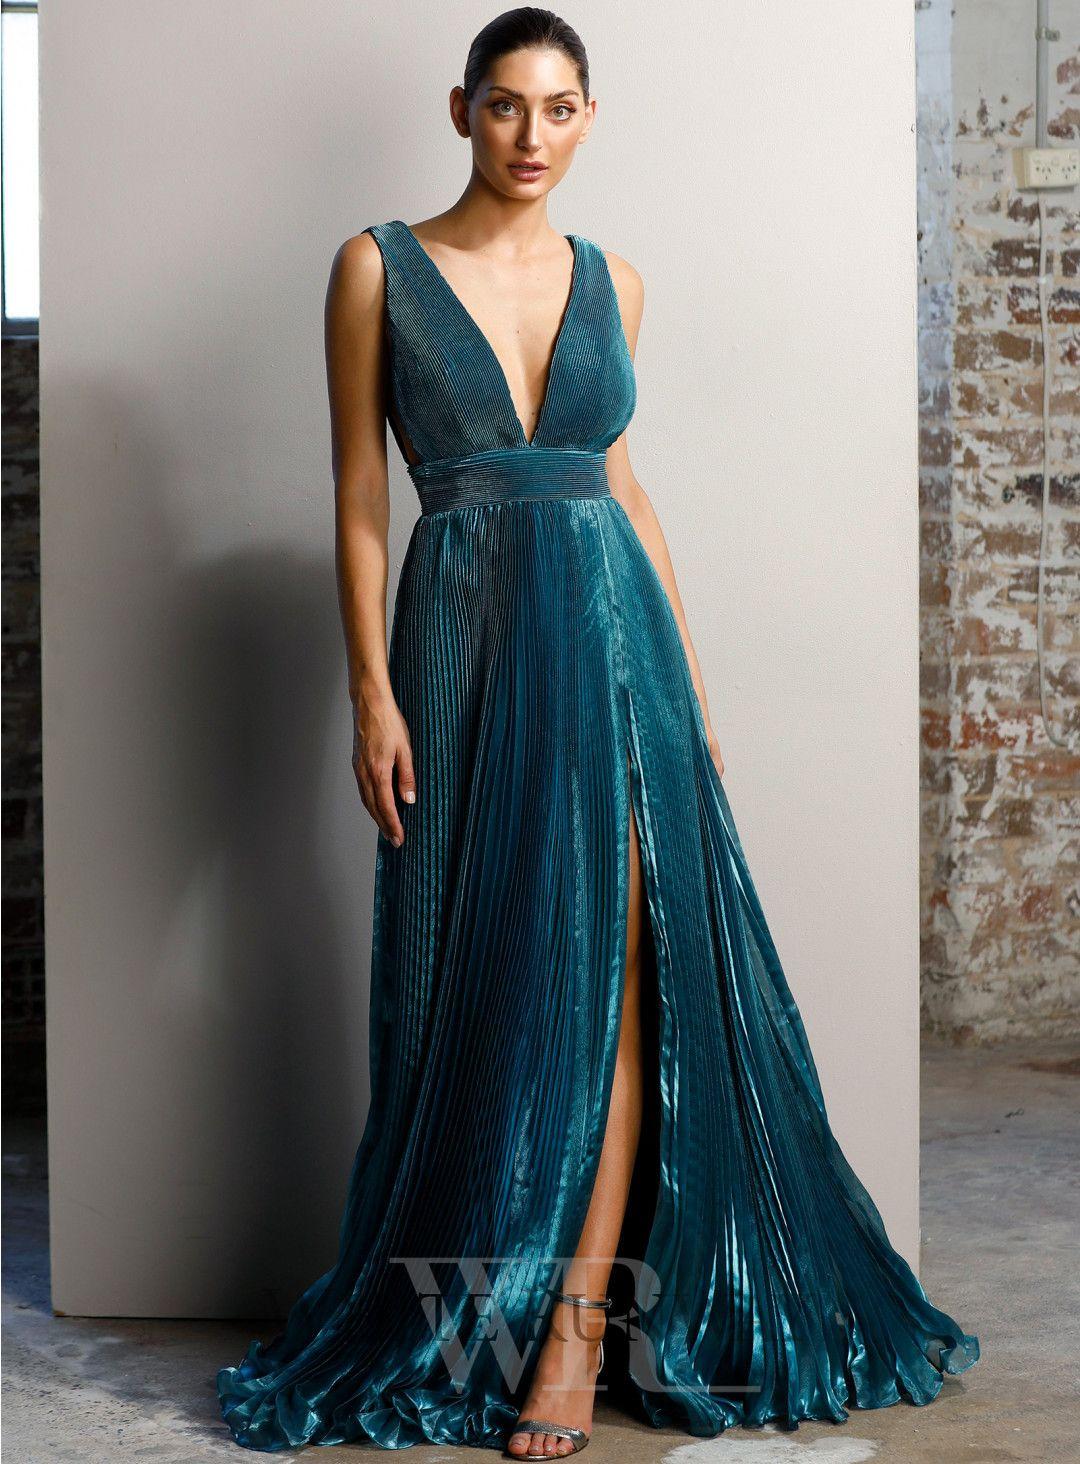 f8f24f70de Maeoni Dress. A beautiful full length dress by Jadore. A deep v-neck style  featuring flowy skirt and leg split.  weddinginspo  bridesmaidfashion  prom  ...